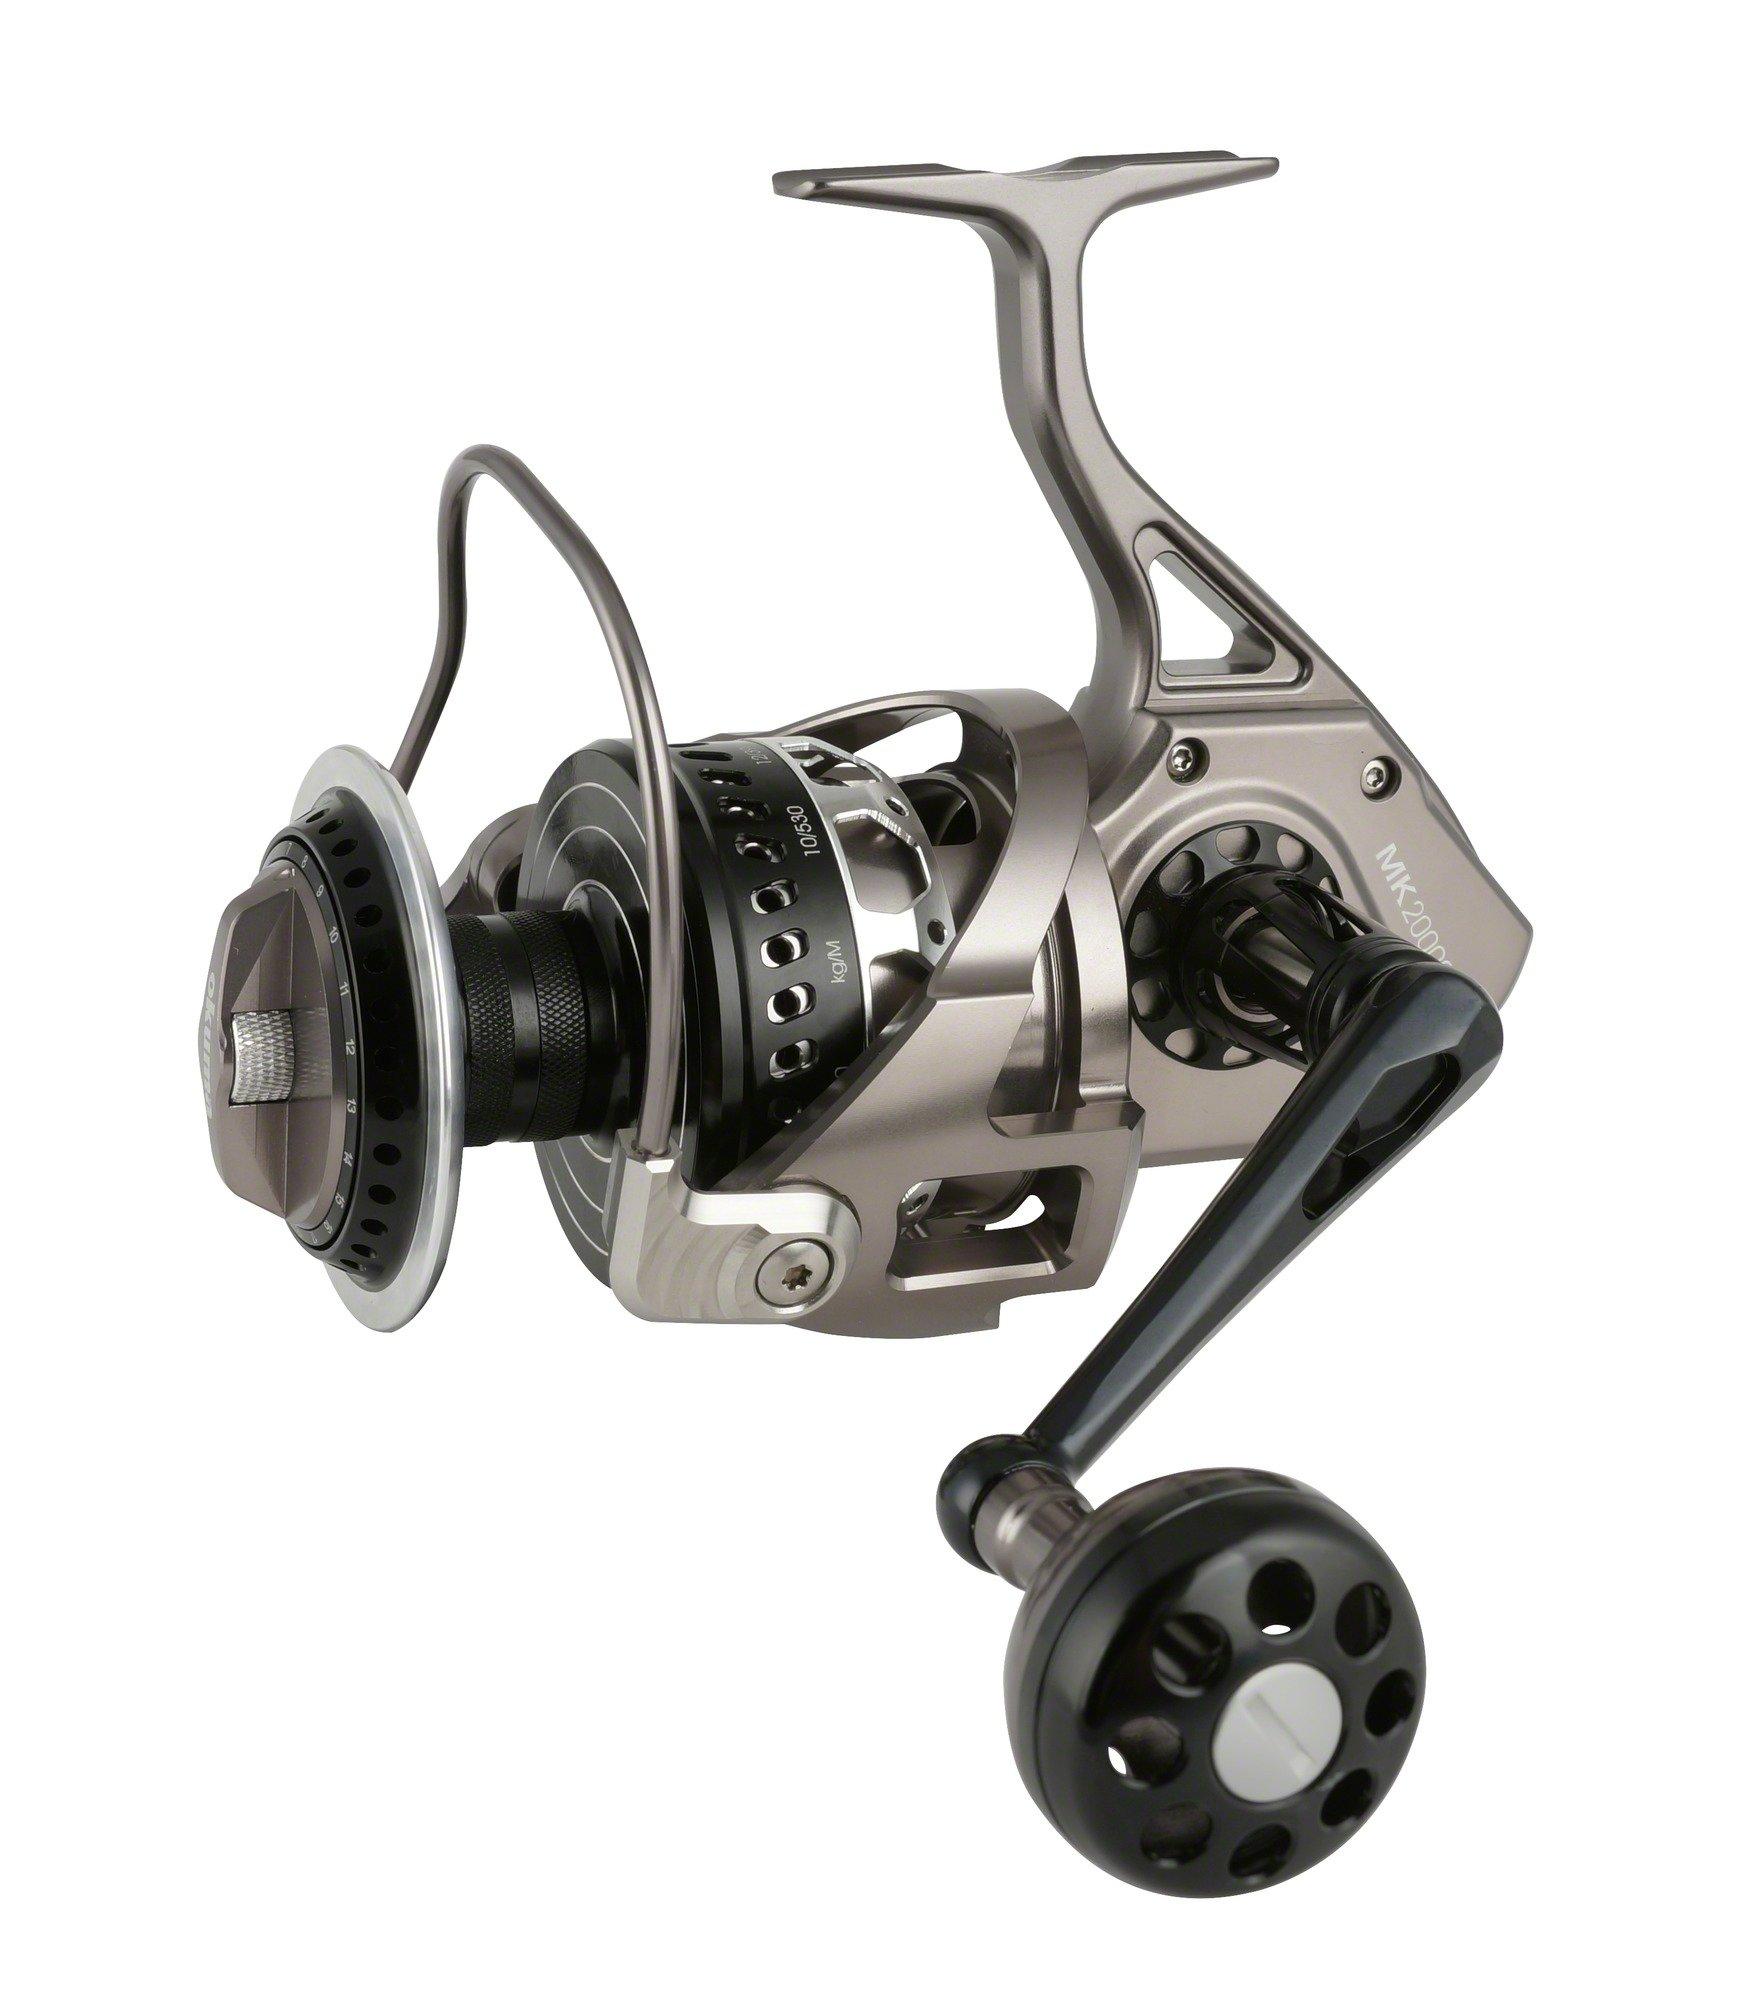 Okuma MK-30000RS Makaira 30000 Fishing Bait by Okuma